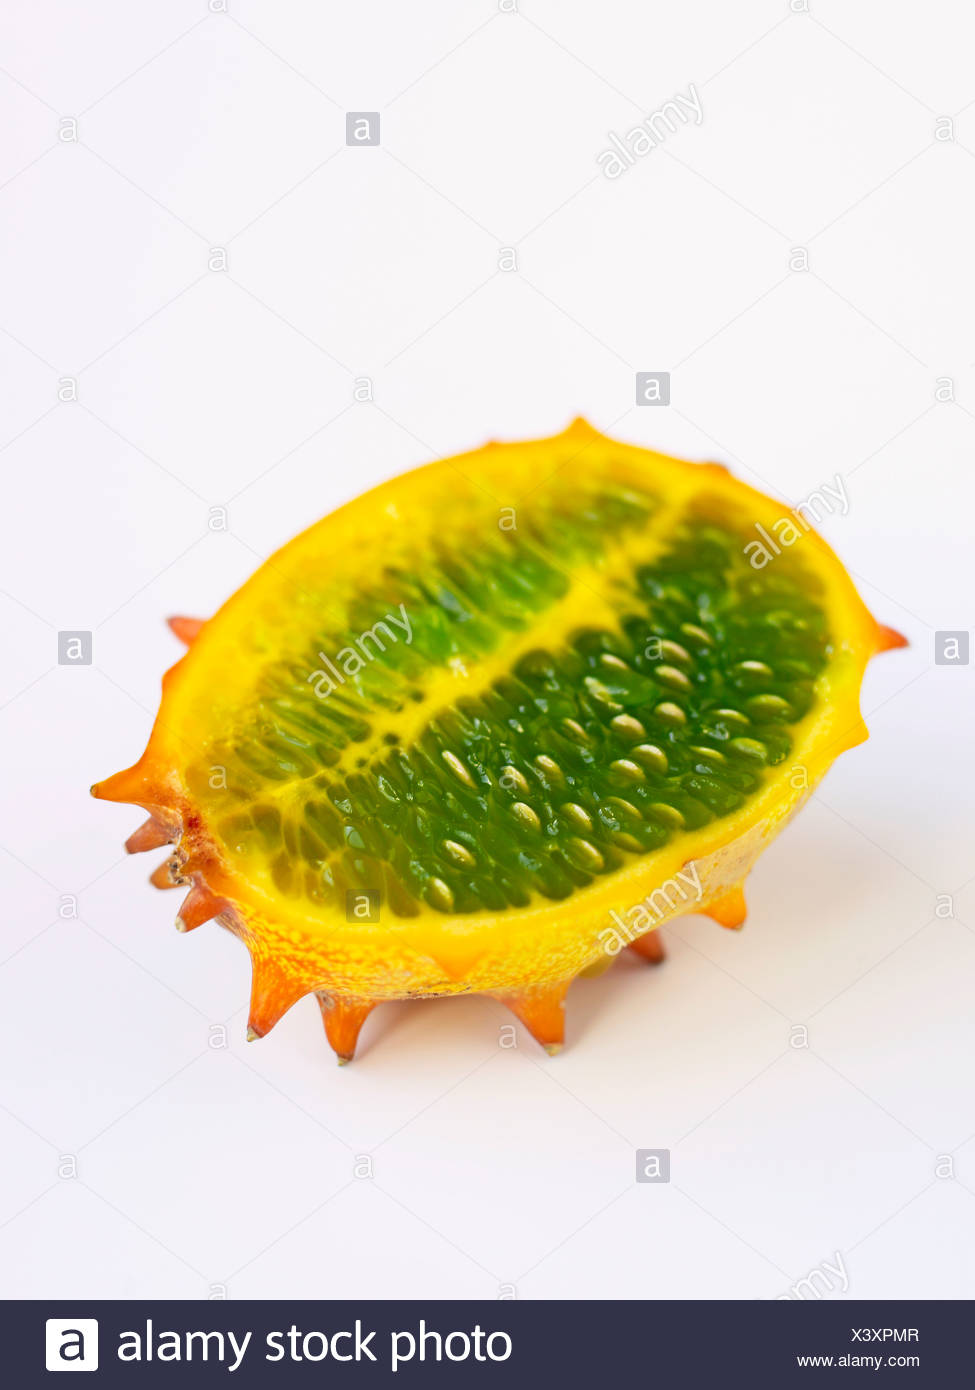 Horned Melon, Kiwano, Kawani Fruit - Stock Image